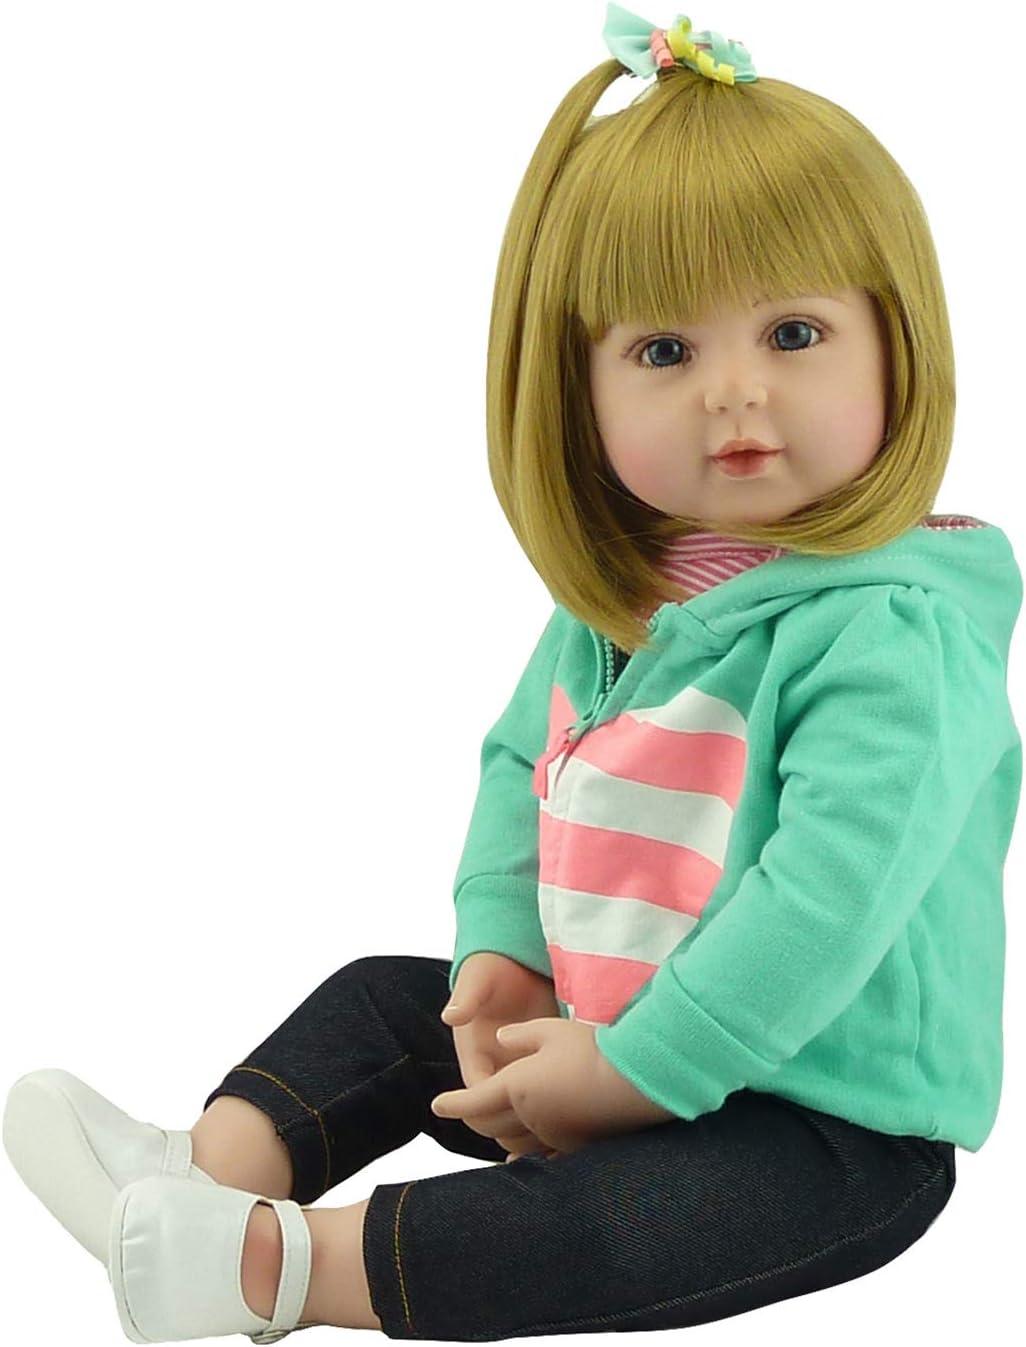 Zero Pam 60cm 24 Pulgadas Bebe Reborn niña Reborn Toddler muñeca Encantadora Chica Realista muñecas Vinilo de Silicona Suave al Tacto